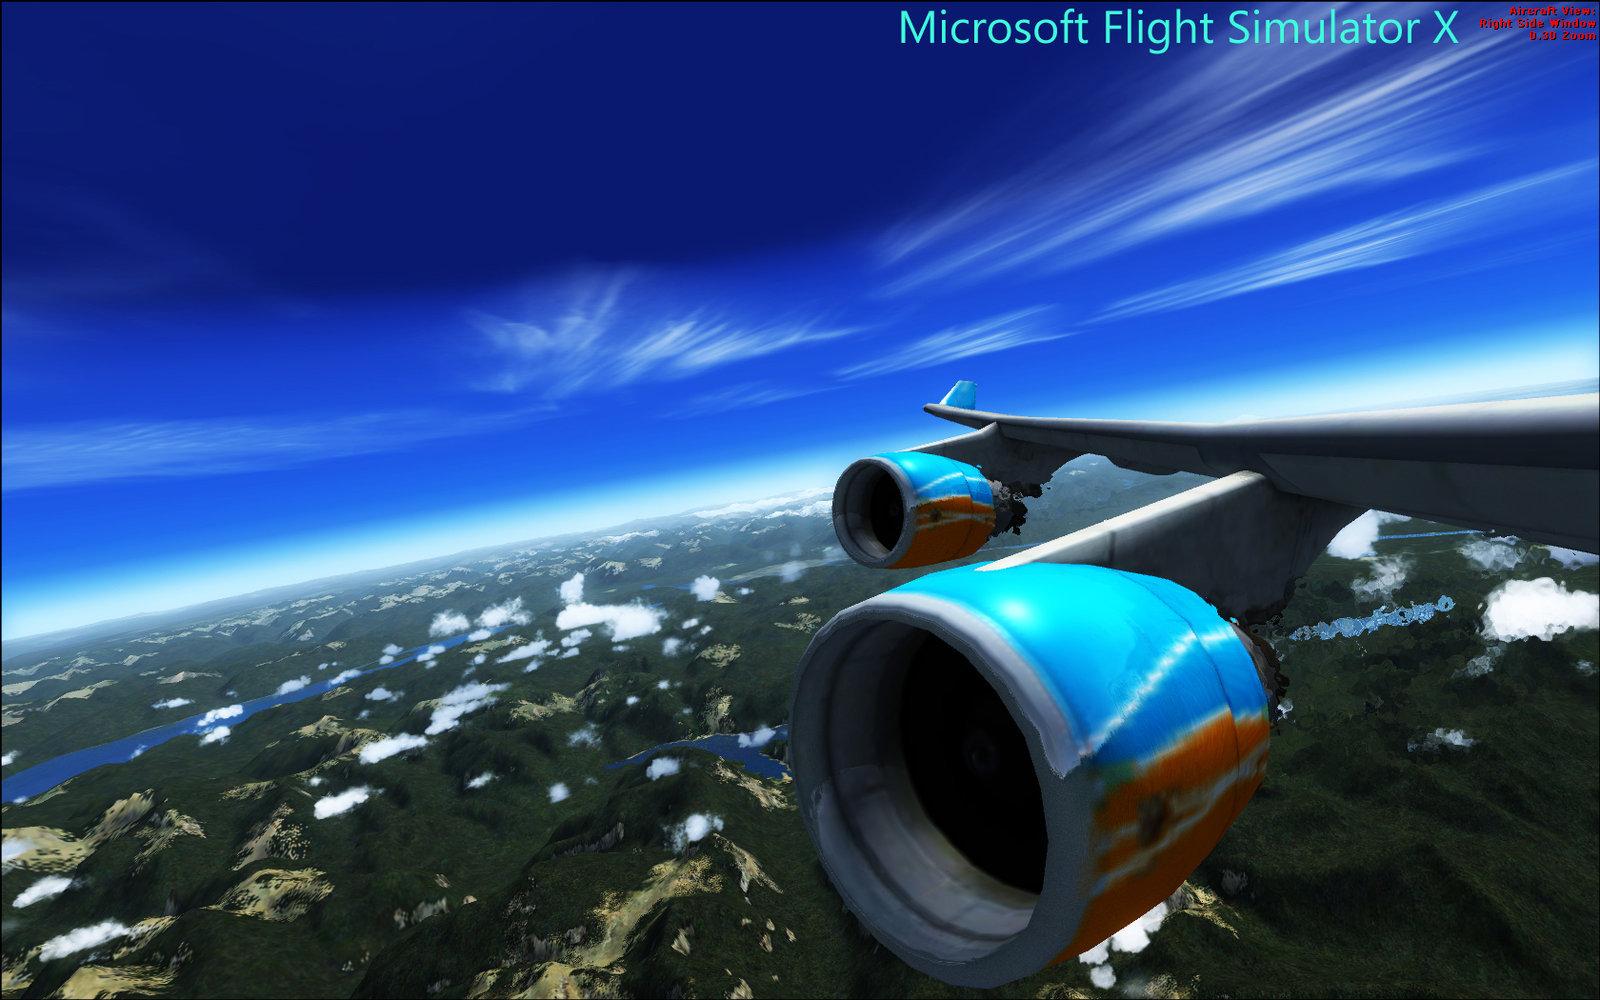 Pin Wallpaper Fsx Flight Simulator X Augusta Westland Eh101 1920 1200 1600x1000